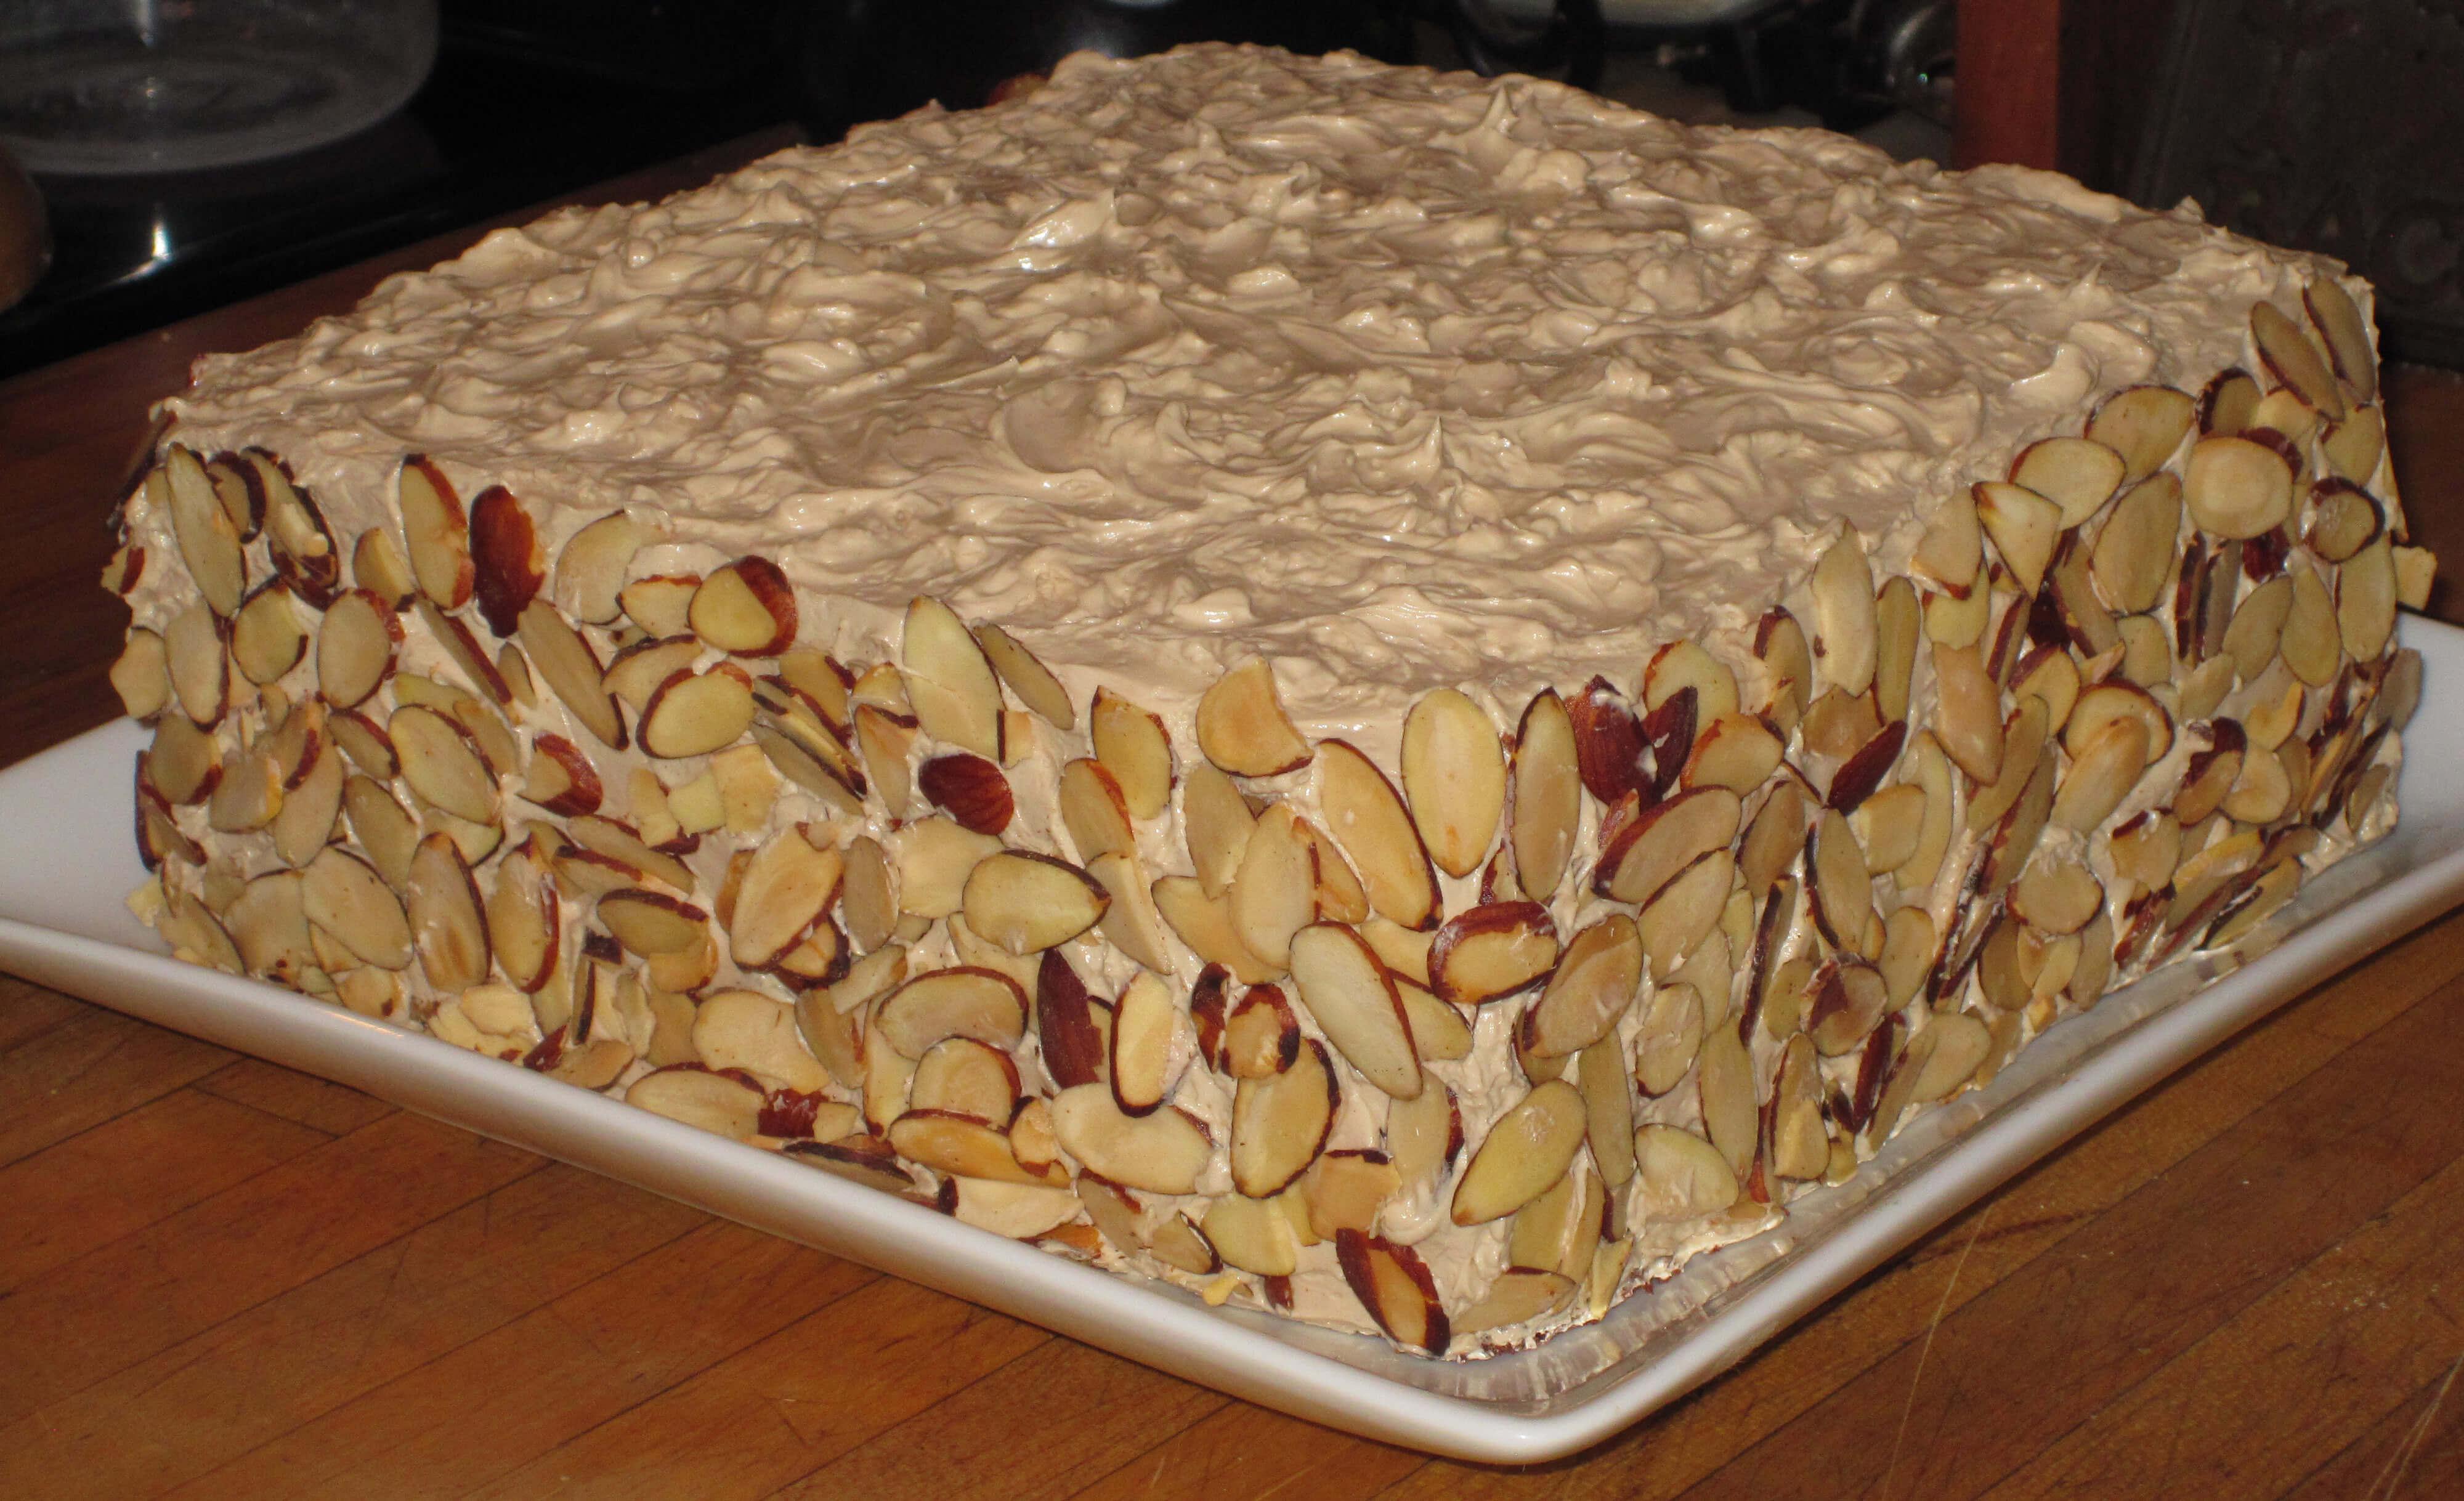 Mocha Almond Toffee Cake